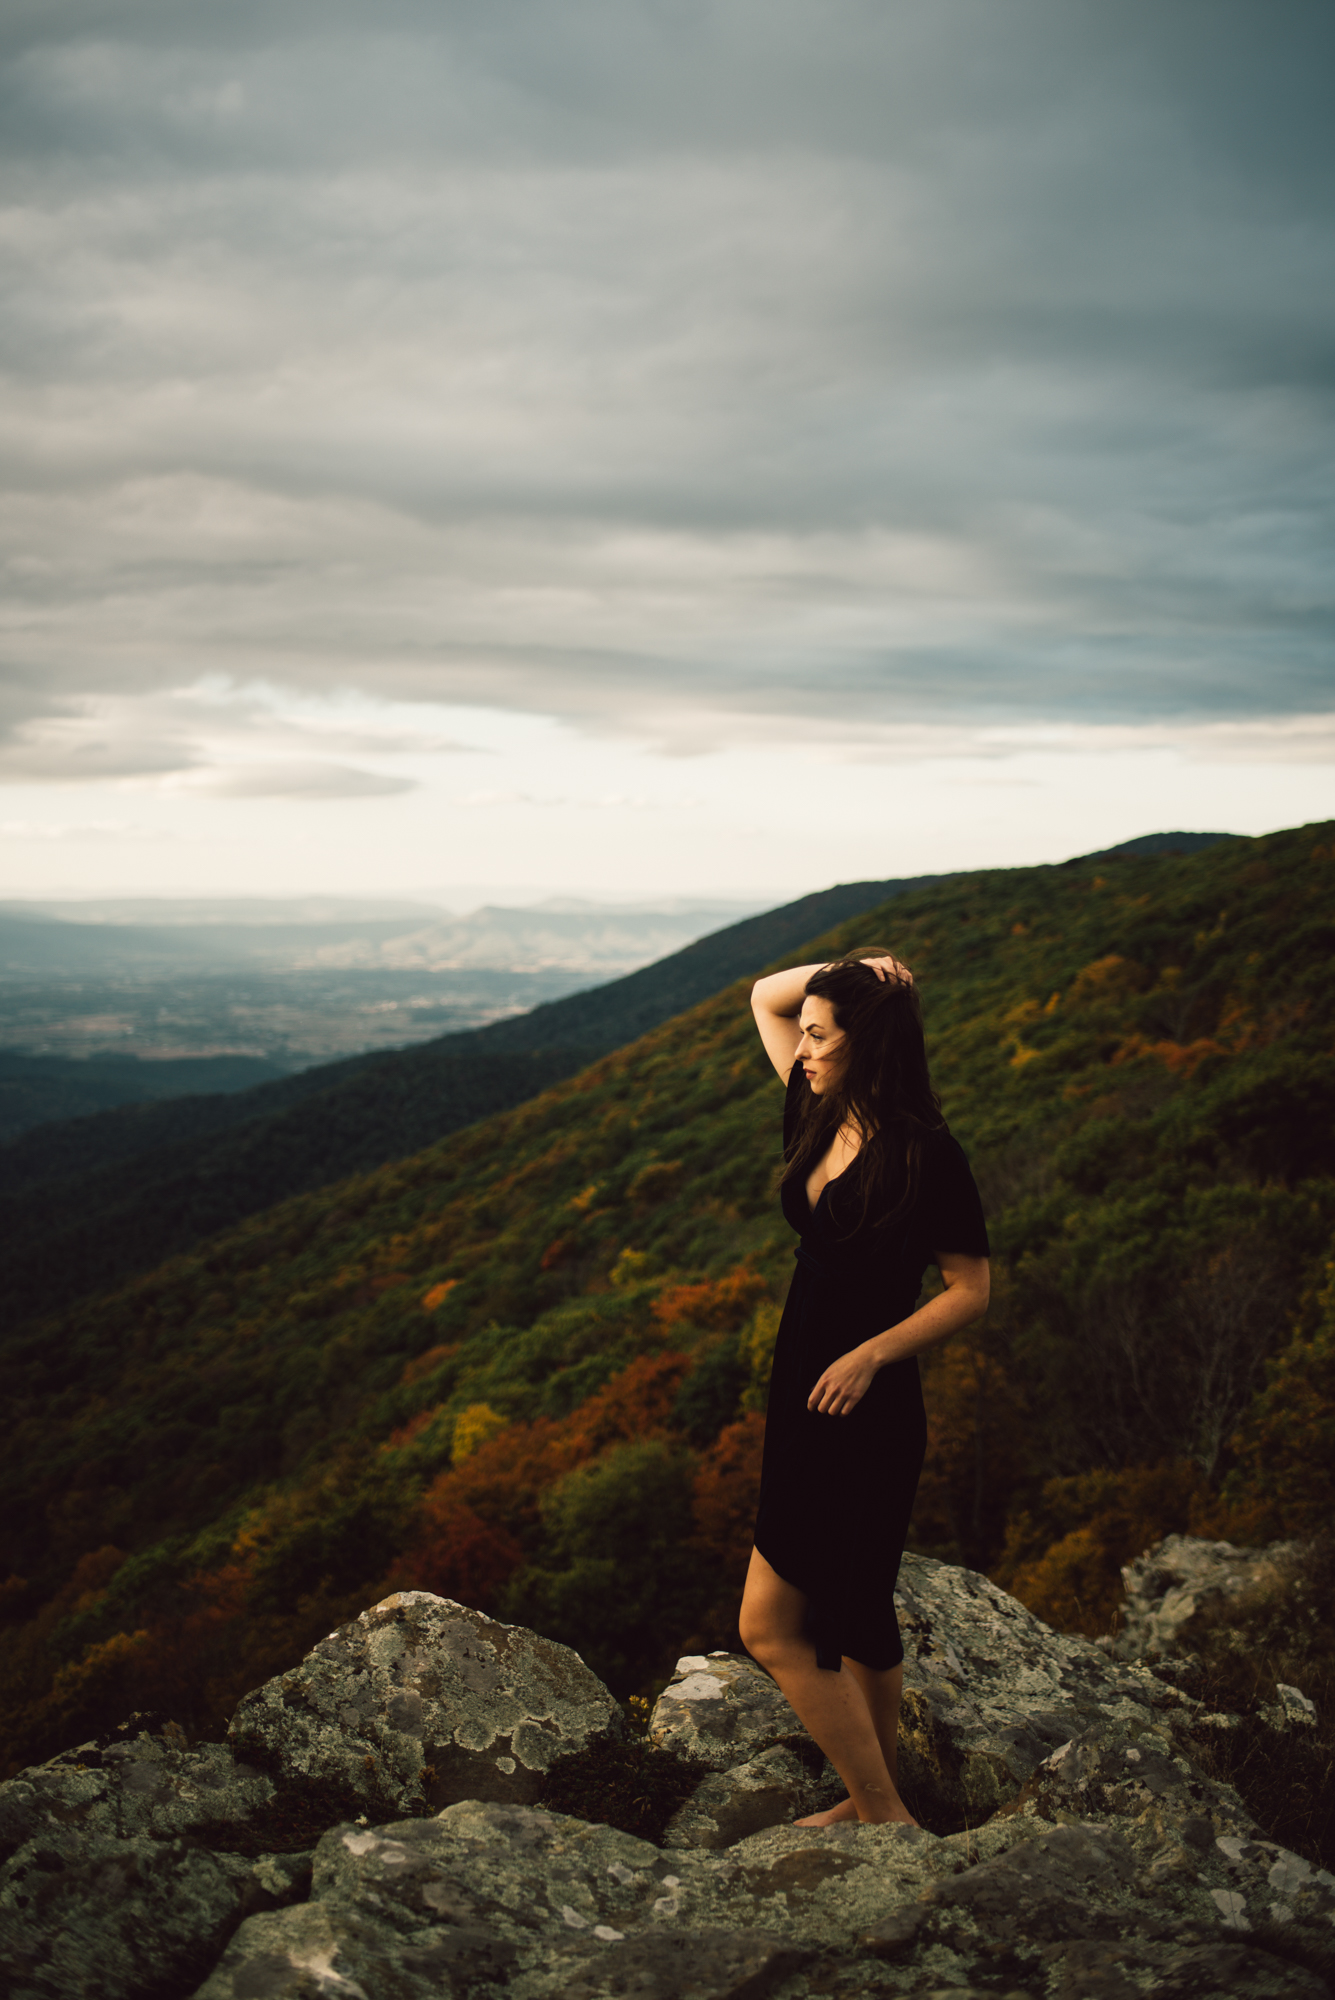 Megan_Shenandoah_National_Park_Windy_Romantic_Portraits_128.JPG